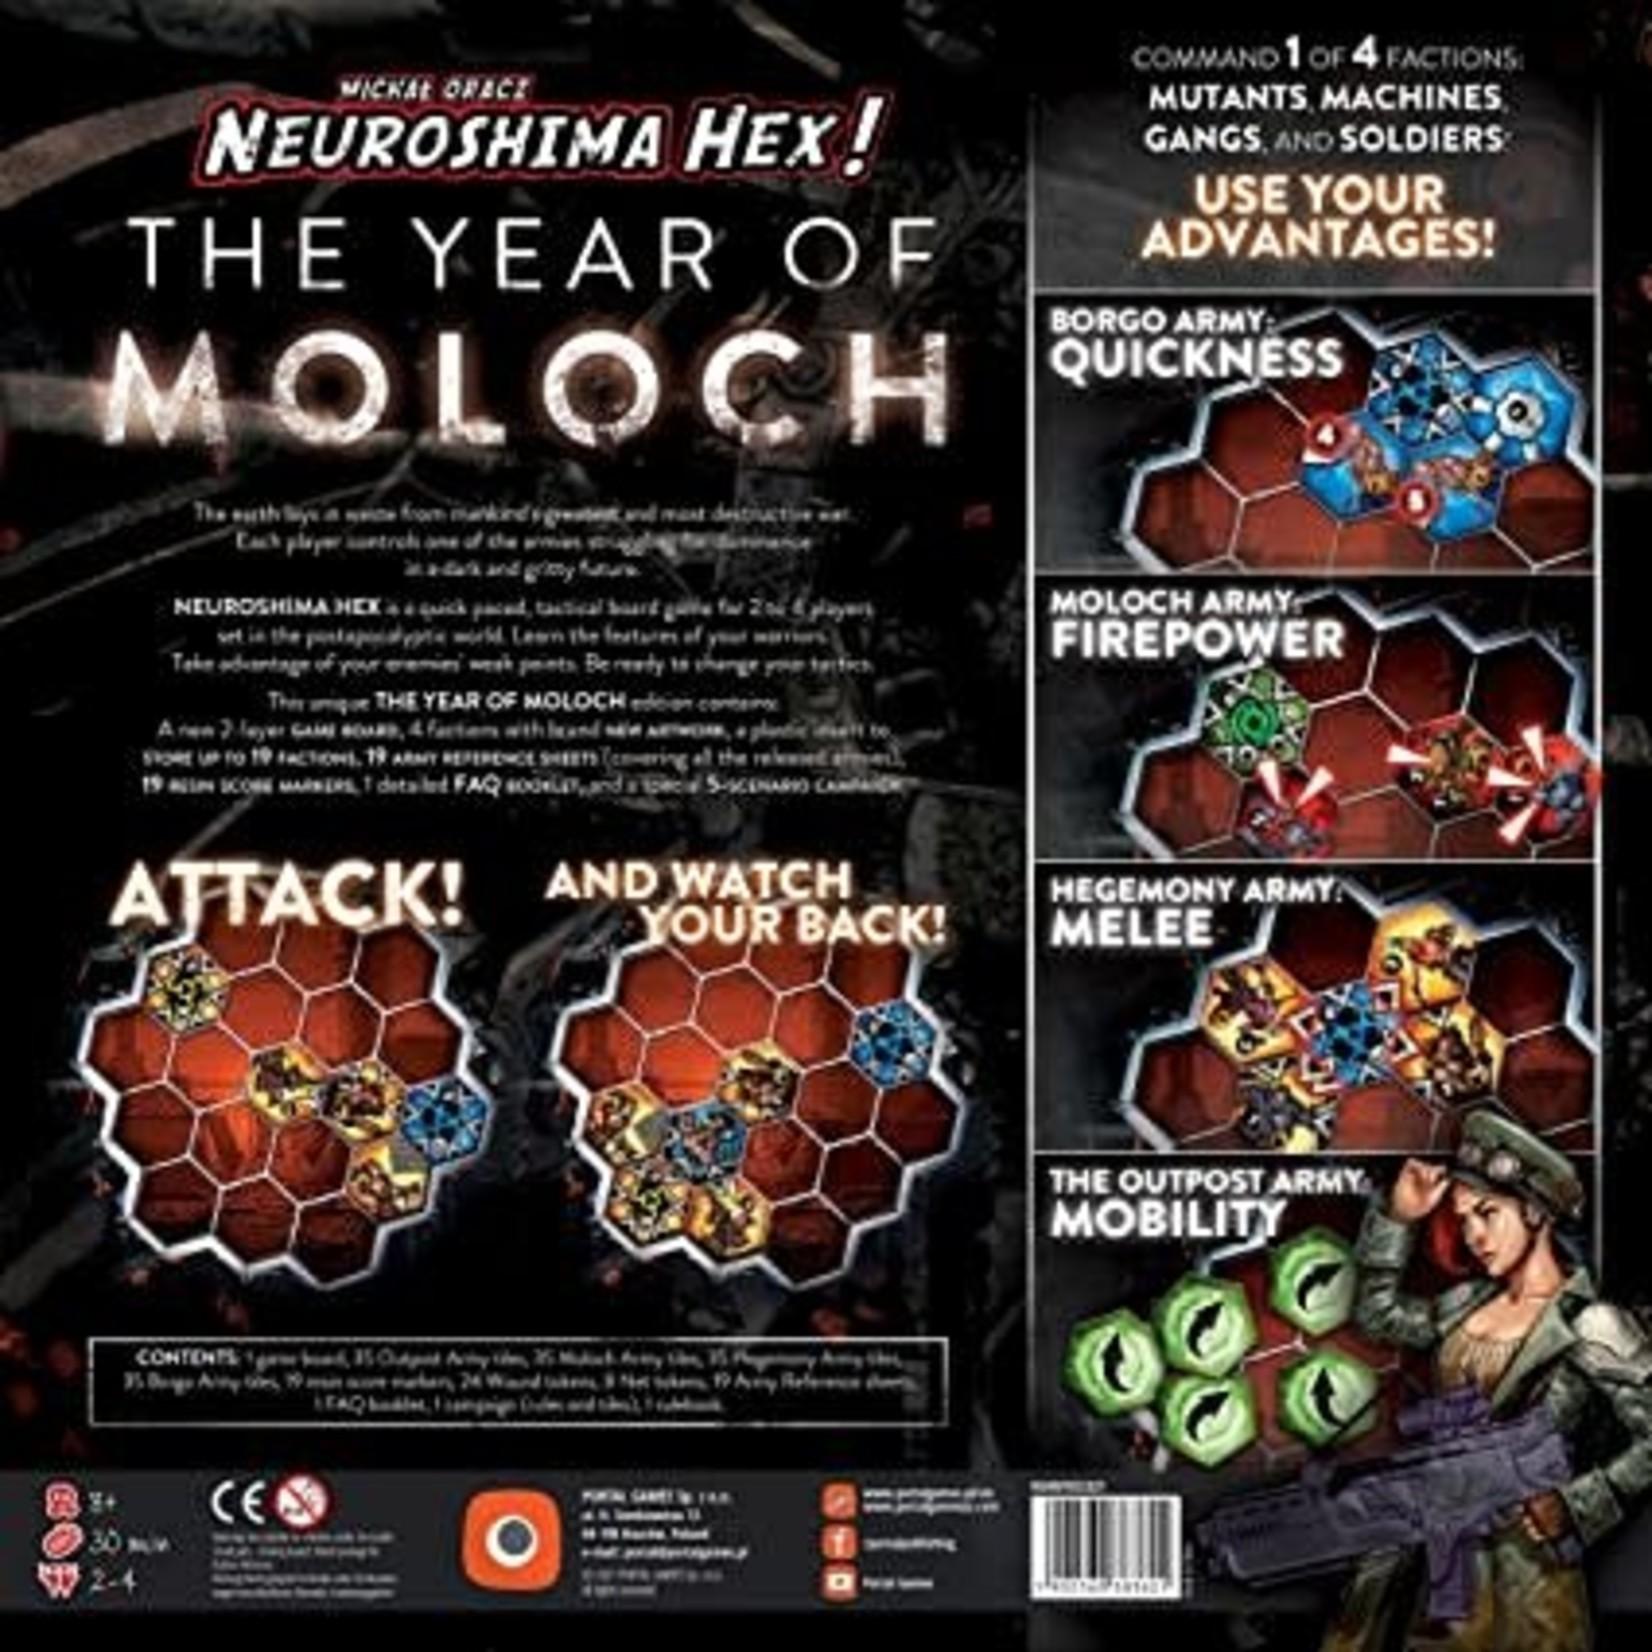 Portal Games Neuroshima Hex 3.0 The Year of Moloch